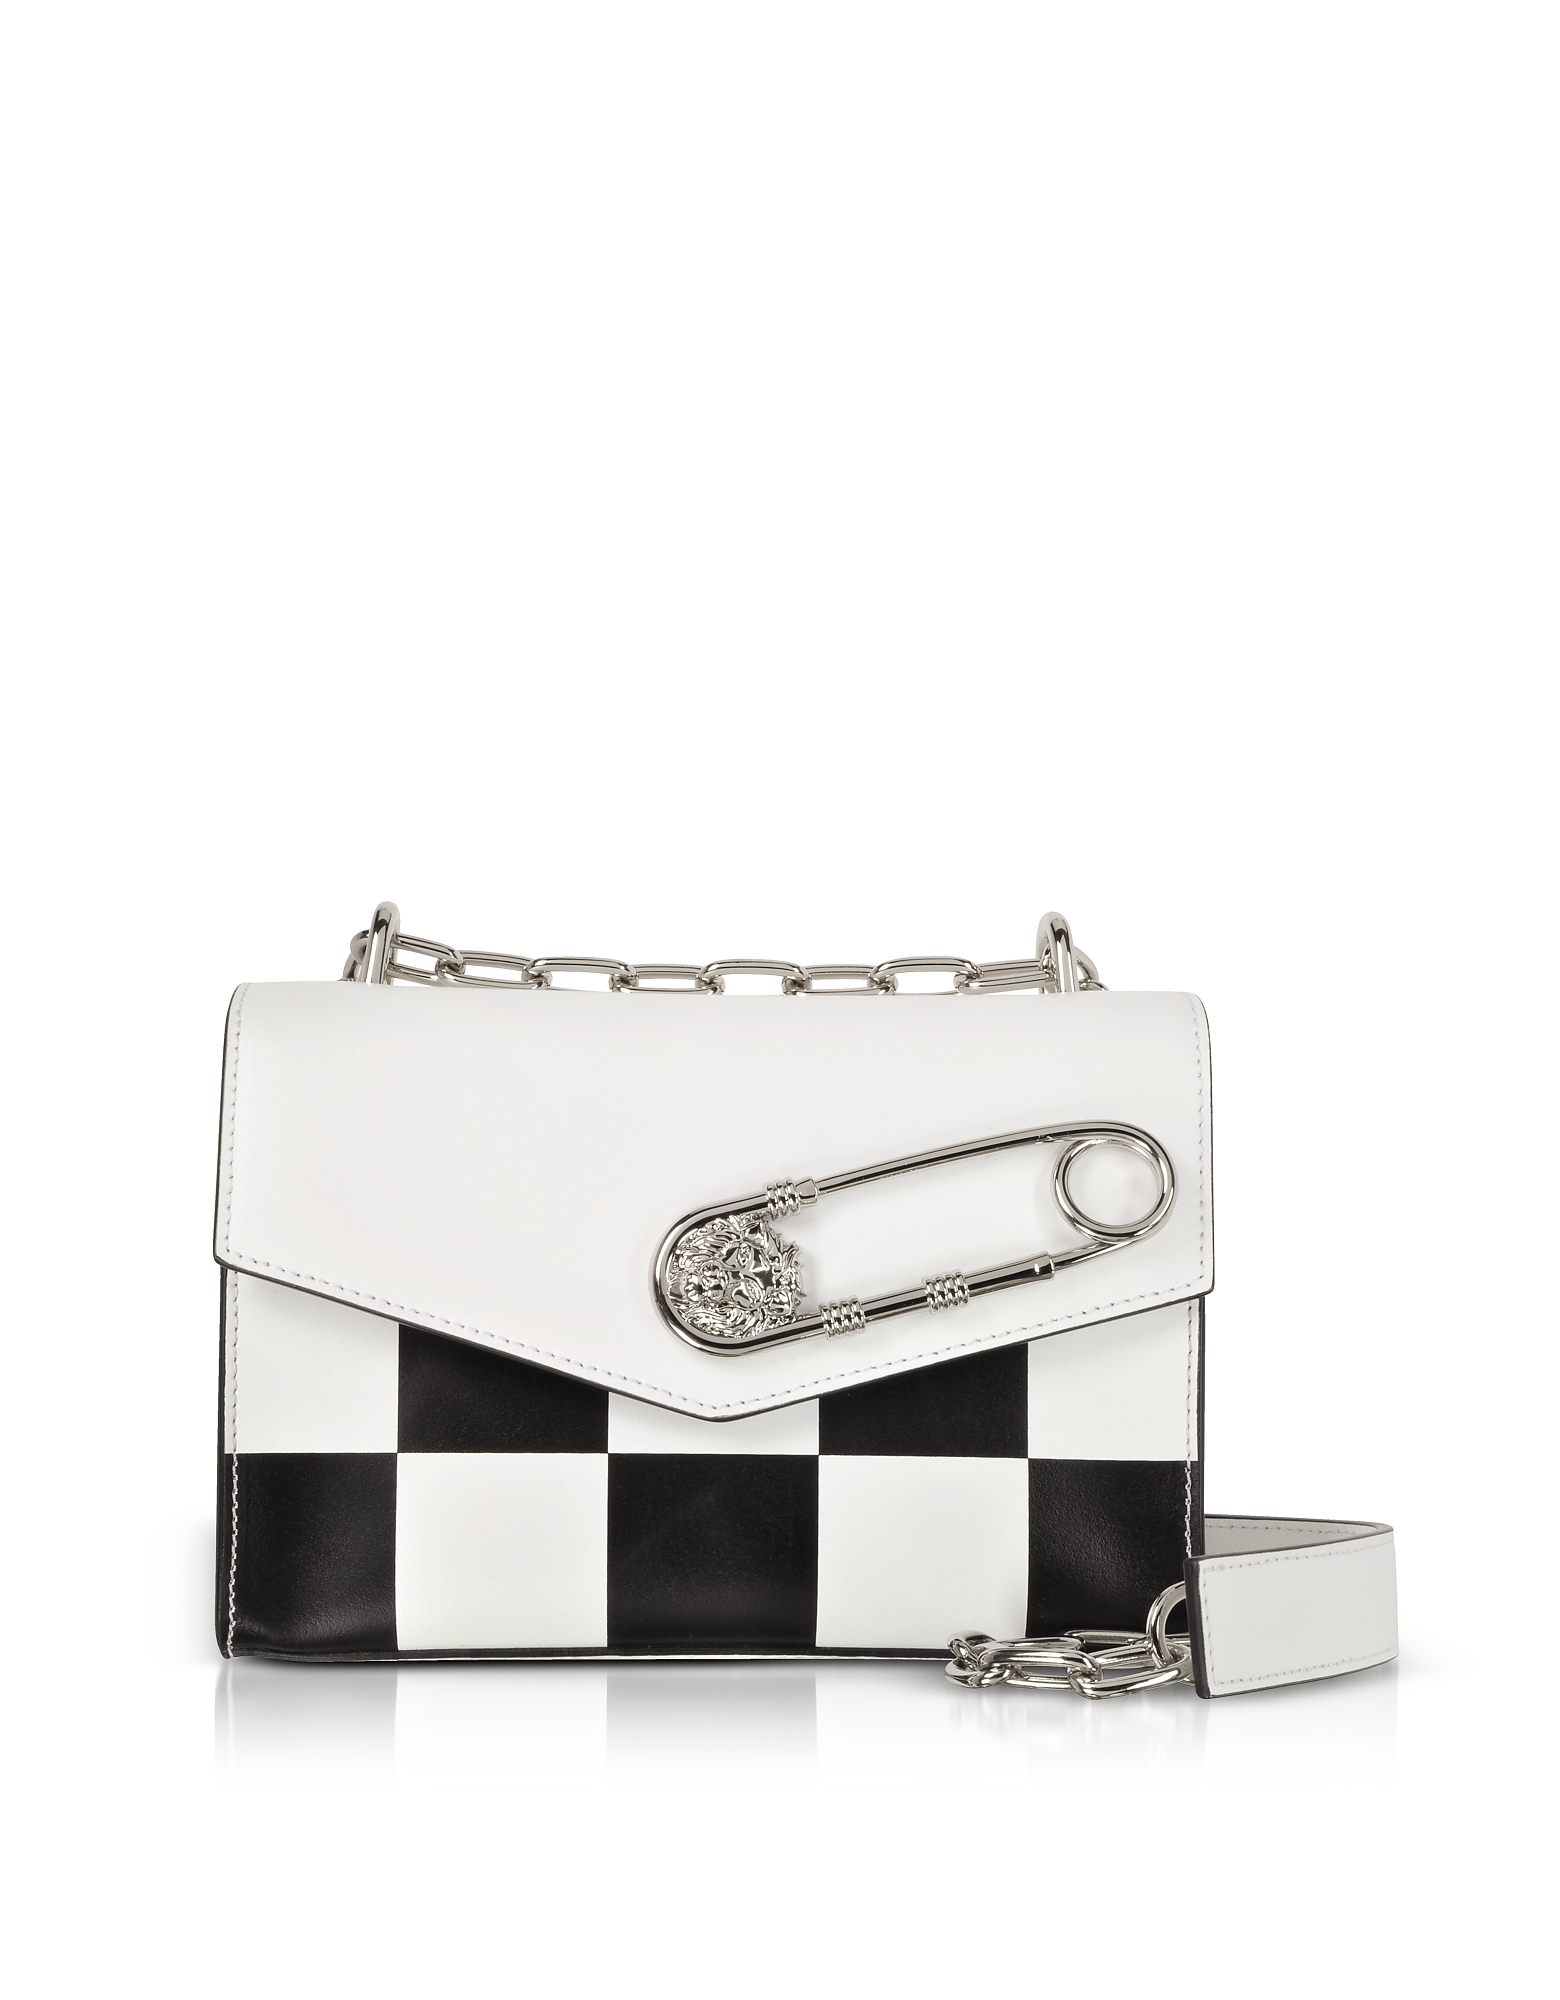 Image of Versace Versus Designer Handbags, Optic White/Black Checkerboard Print Leather Shoulder Bag w/Safety Pin